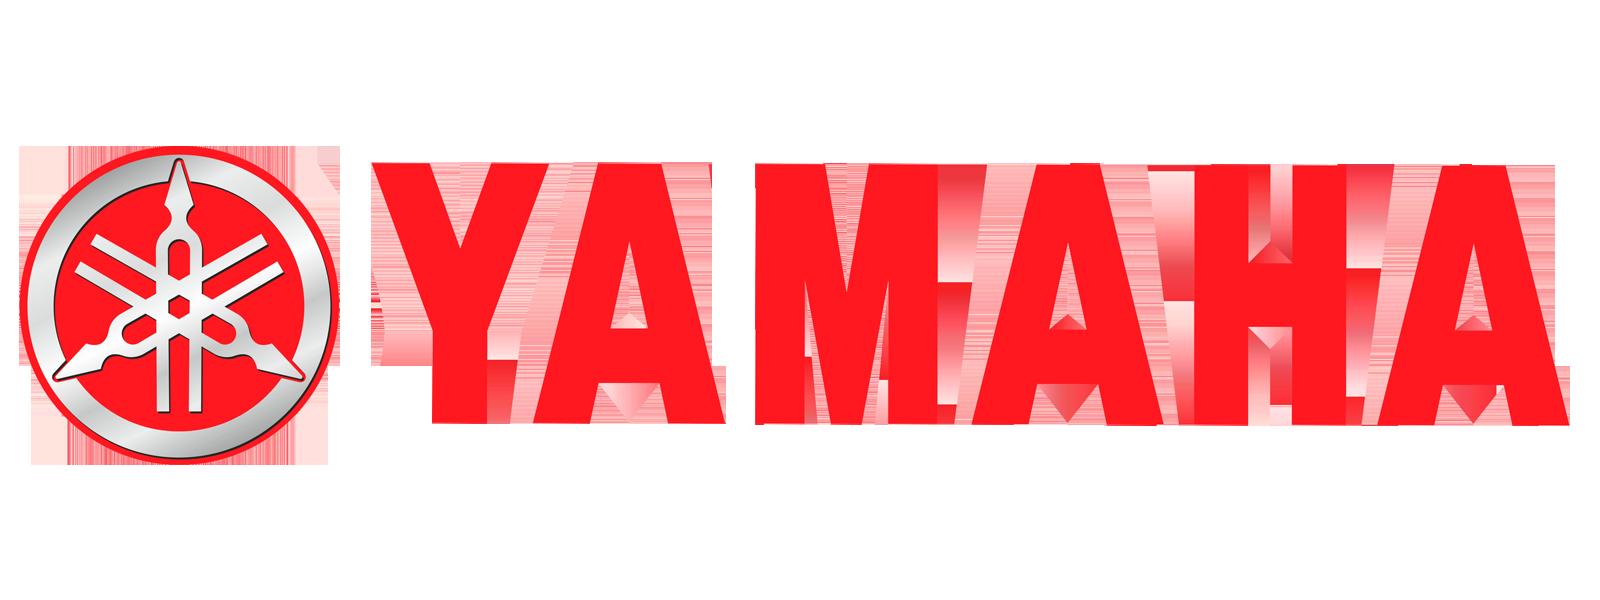 kisspng-yamaha-motor-company-yamaha-corporation-bmw-motorc-yamaha-5ac5fd1e572db7.7727304915229248303571